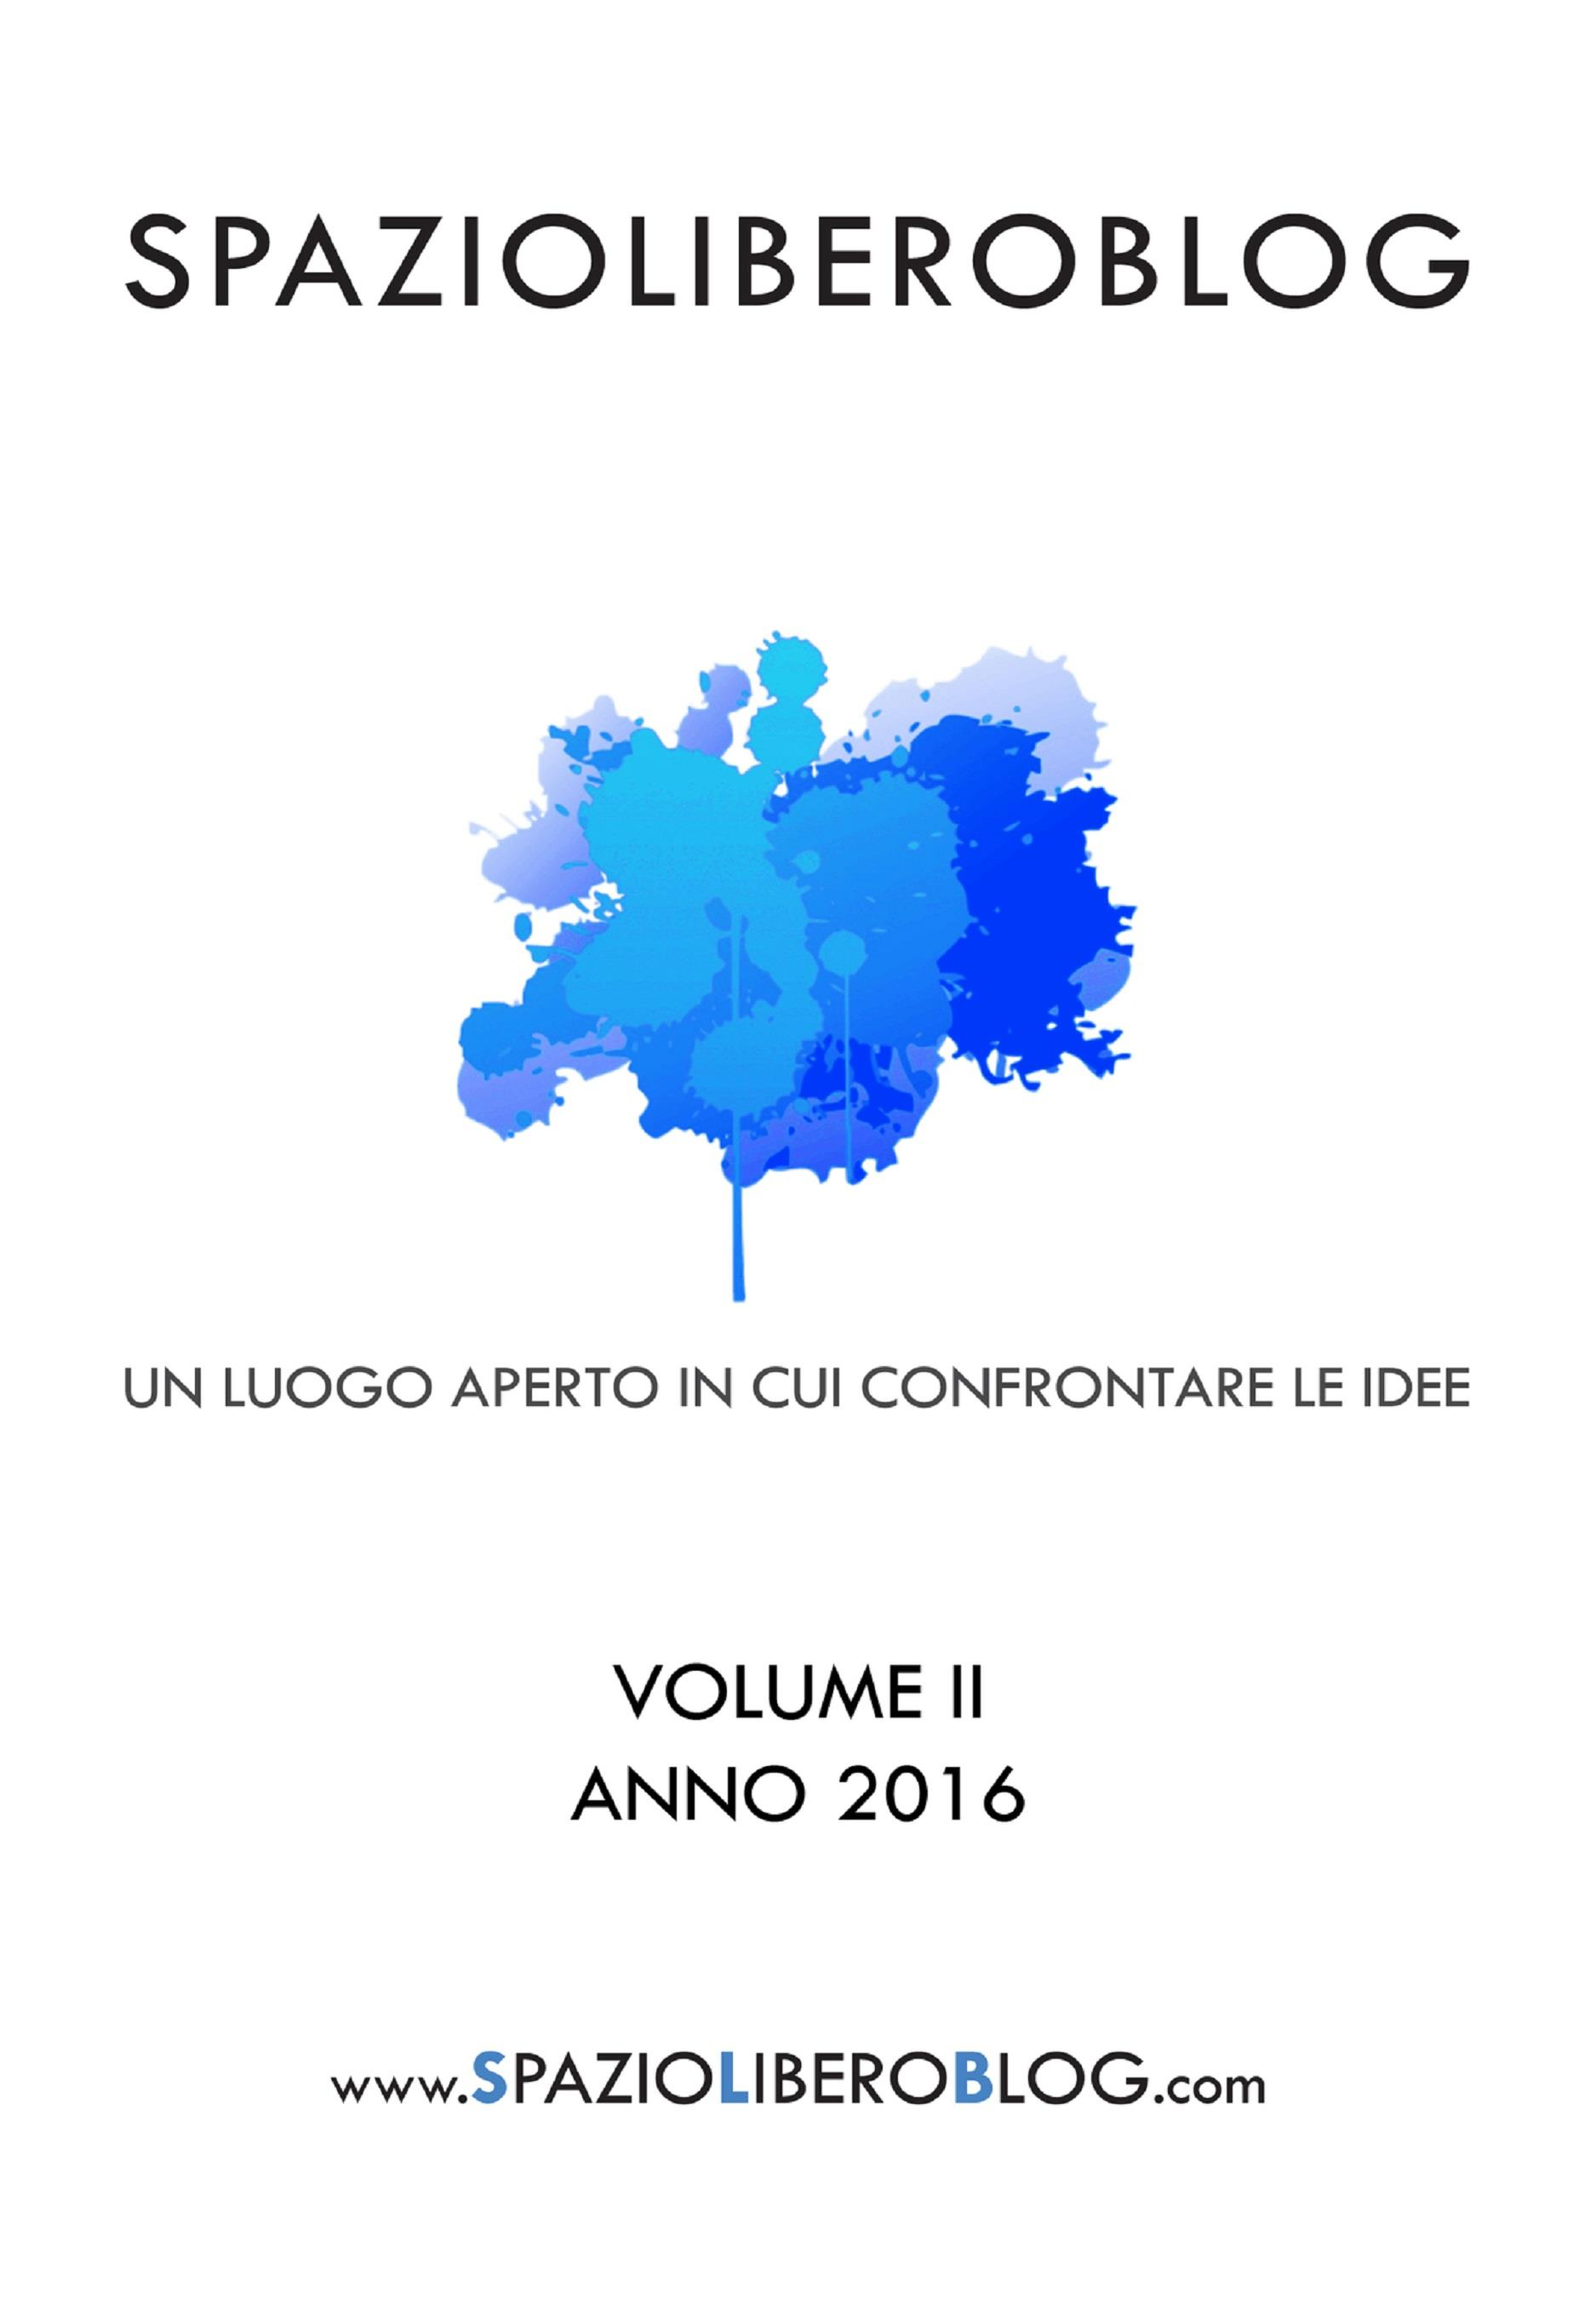 Spazioliberoblog - Volume 2